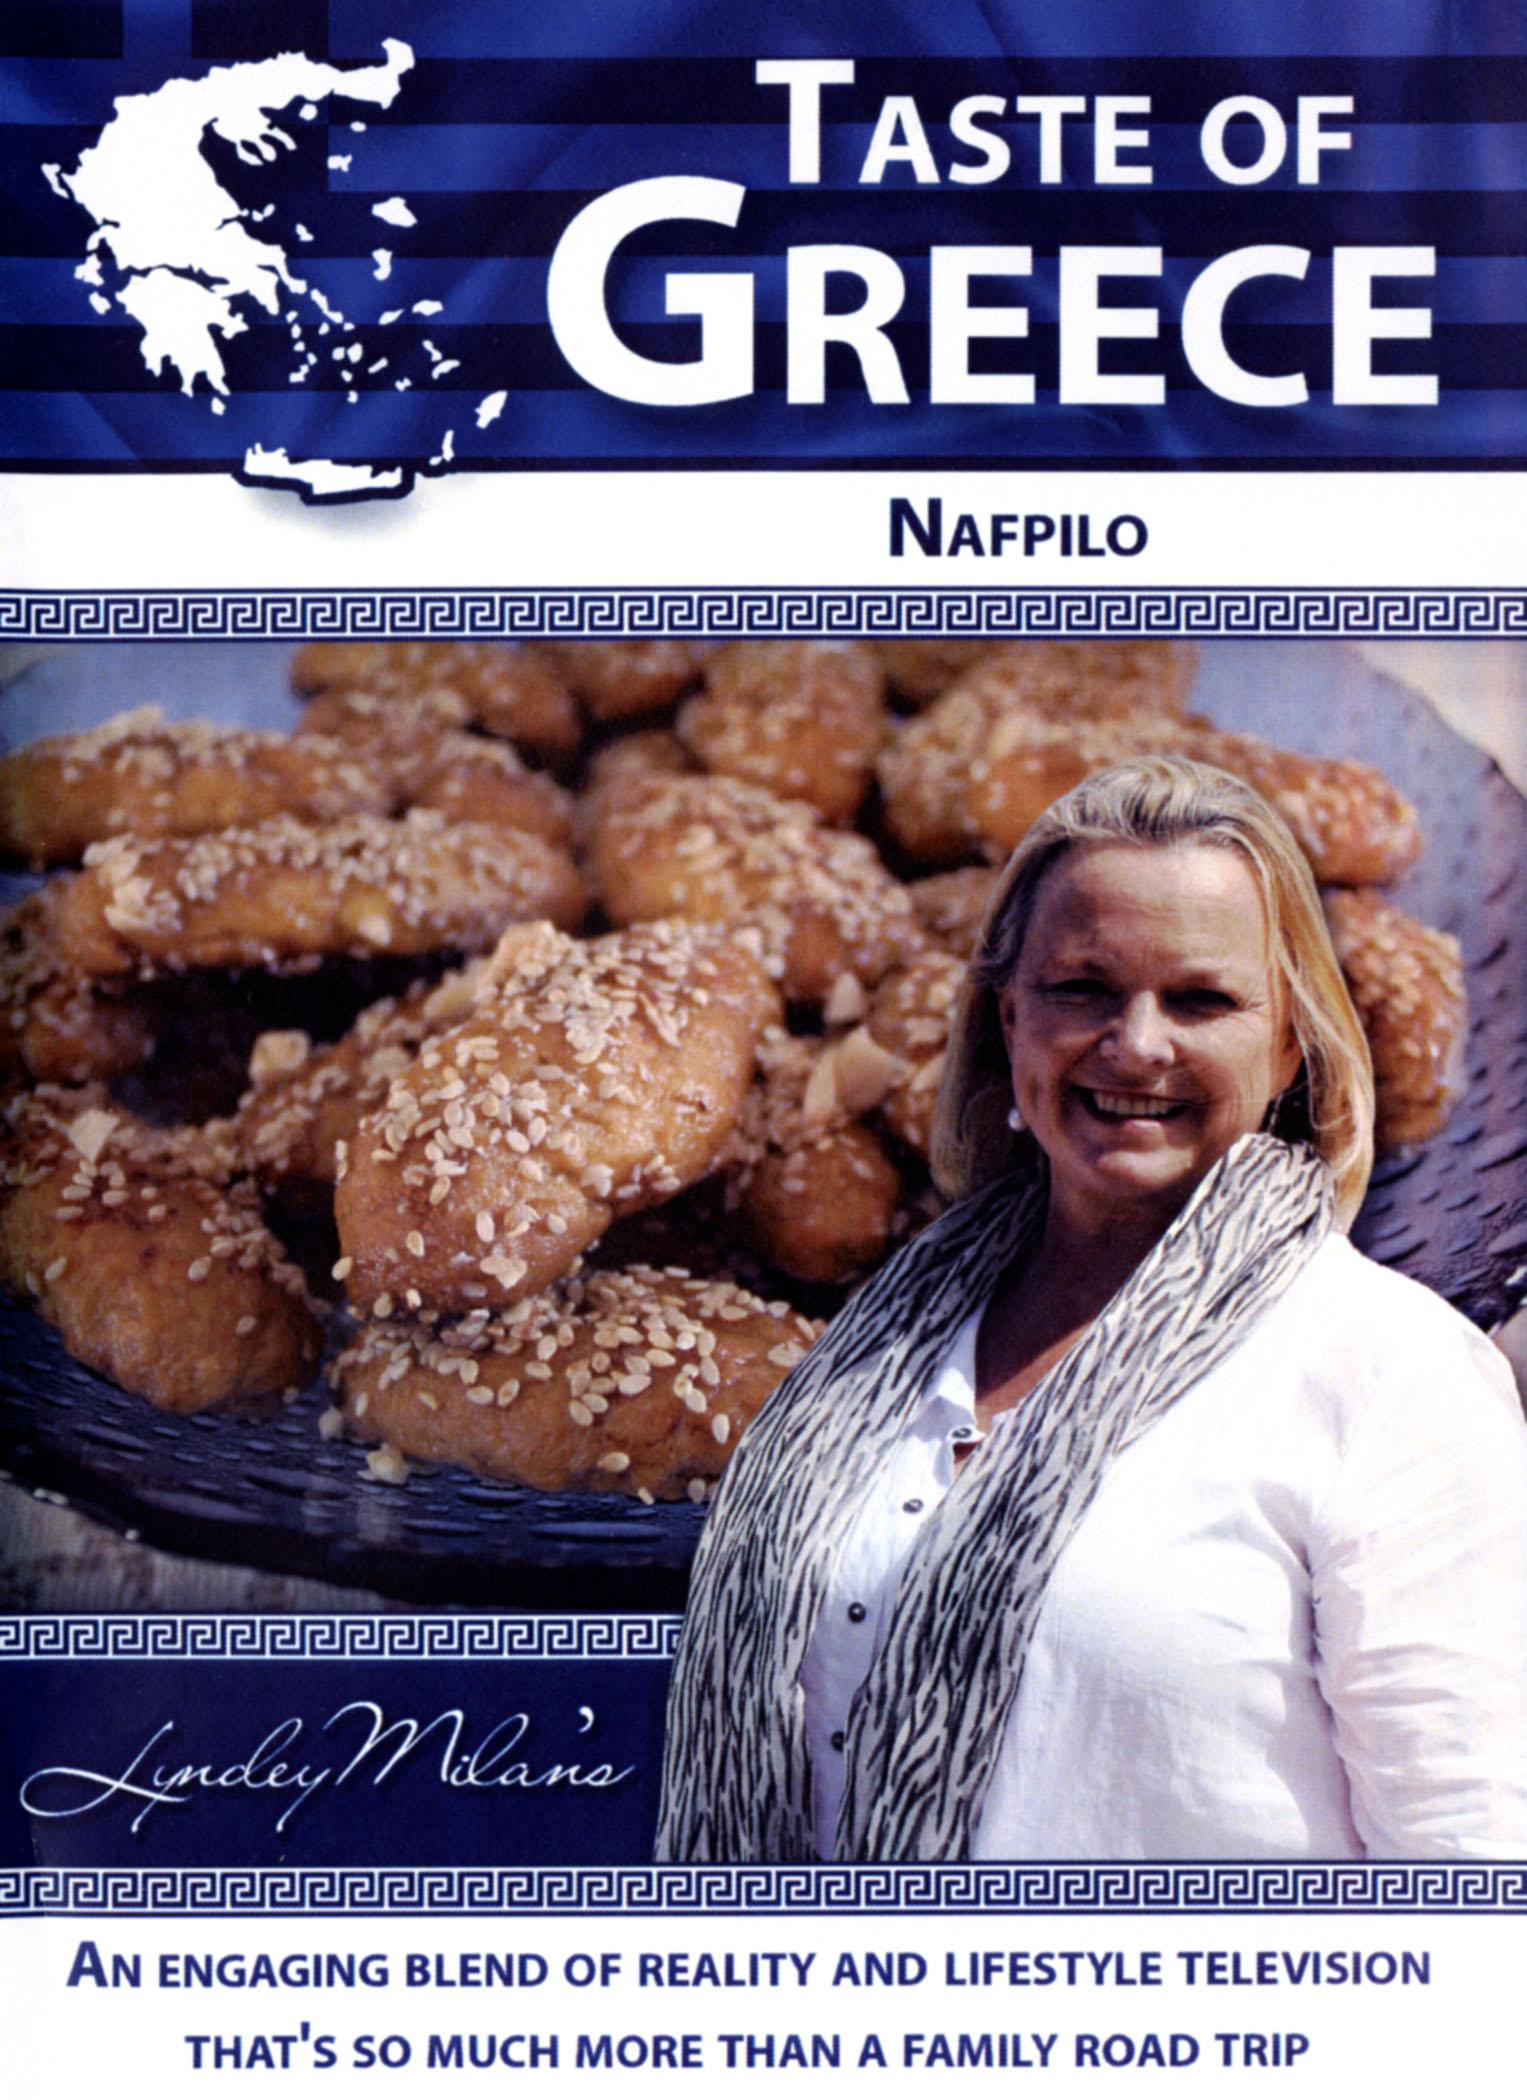 Taste of Greece: Nafpilo